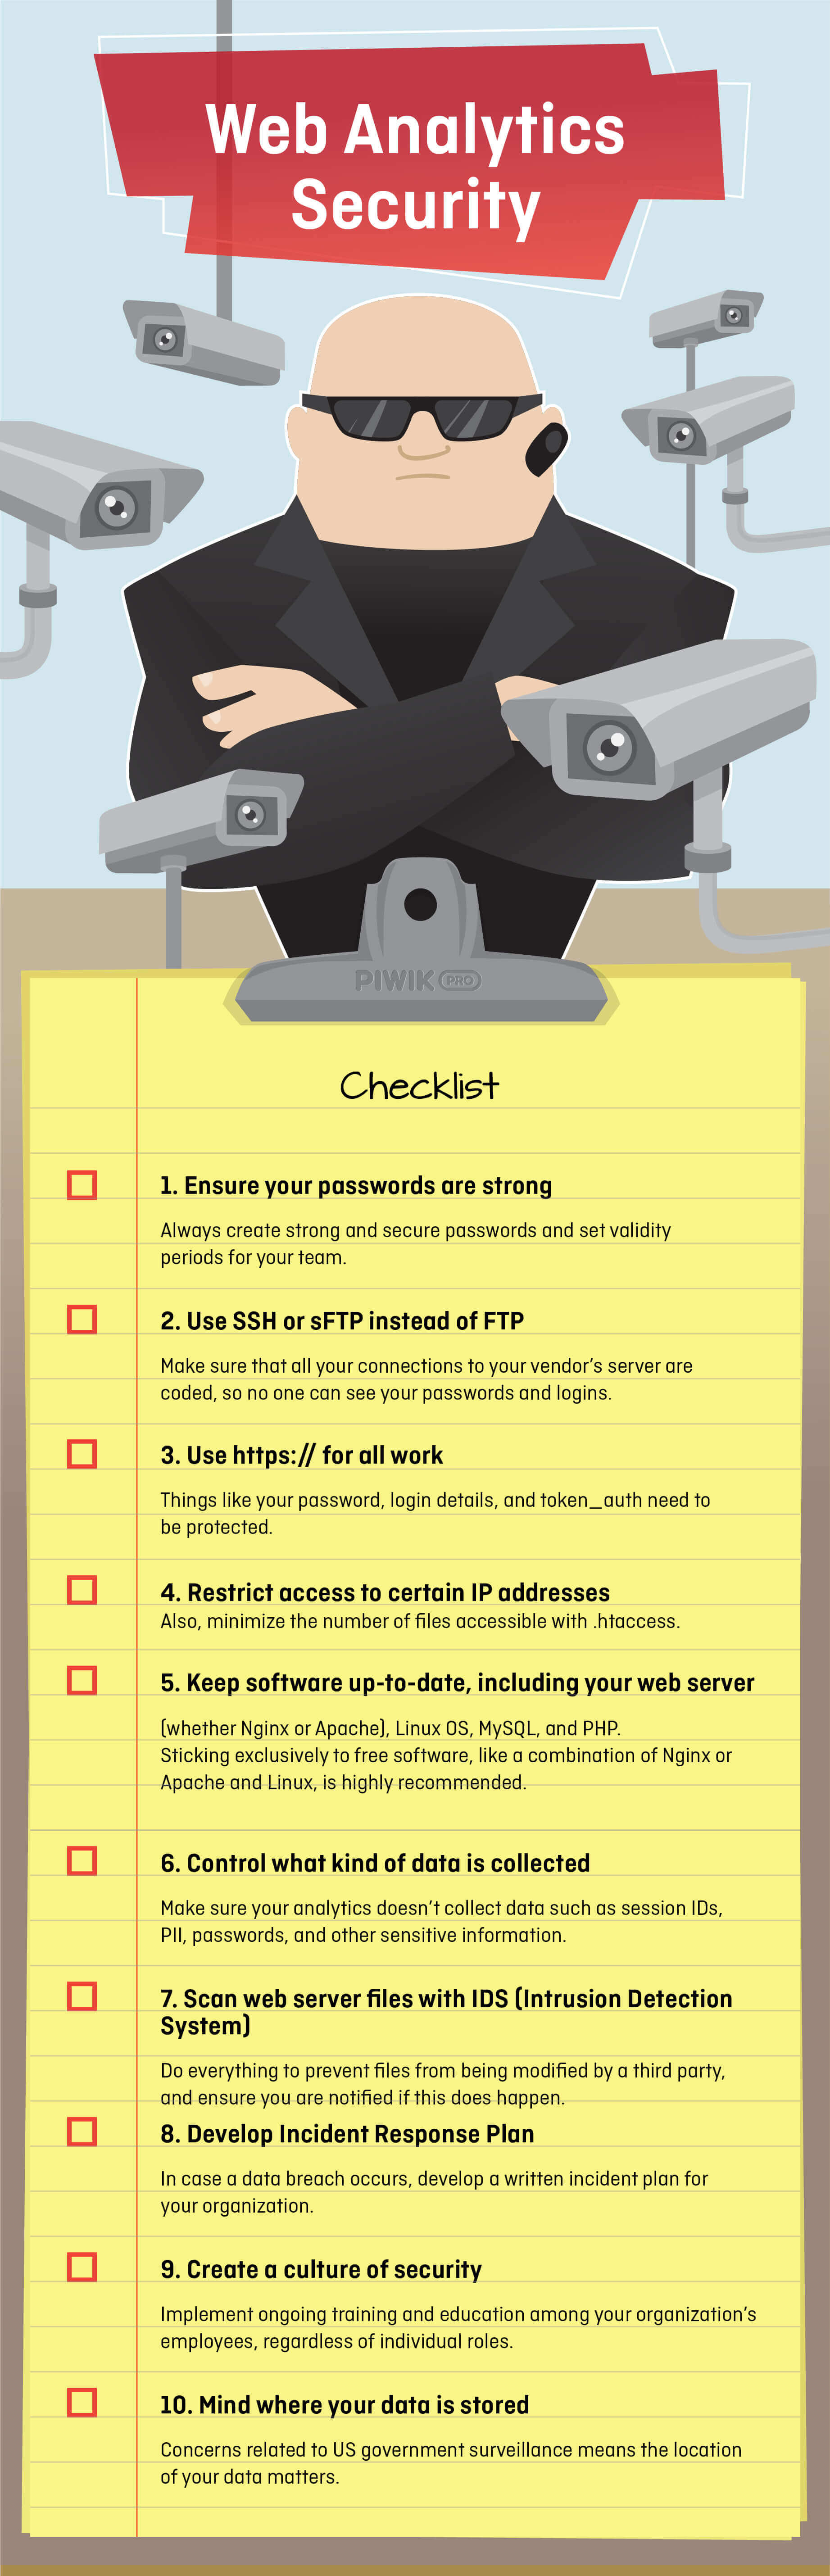 Web Analytics Security Checklist